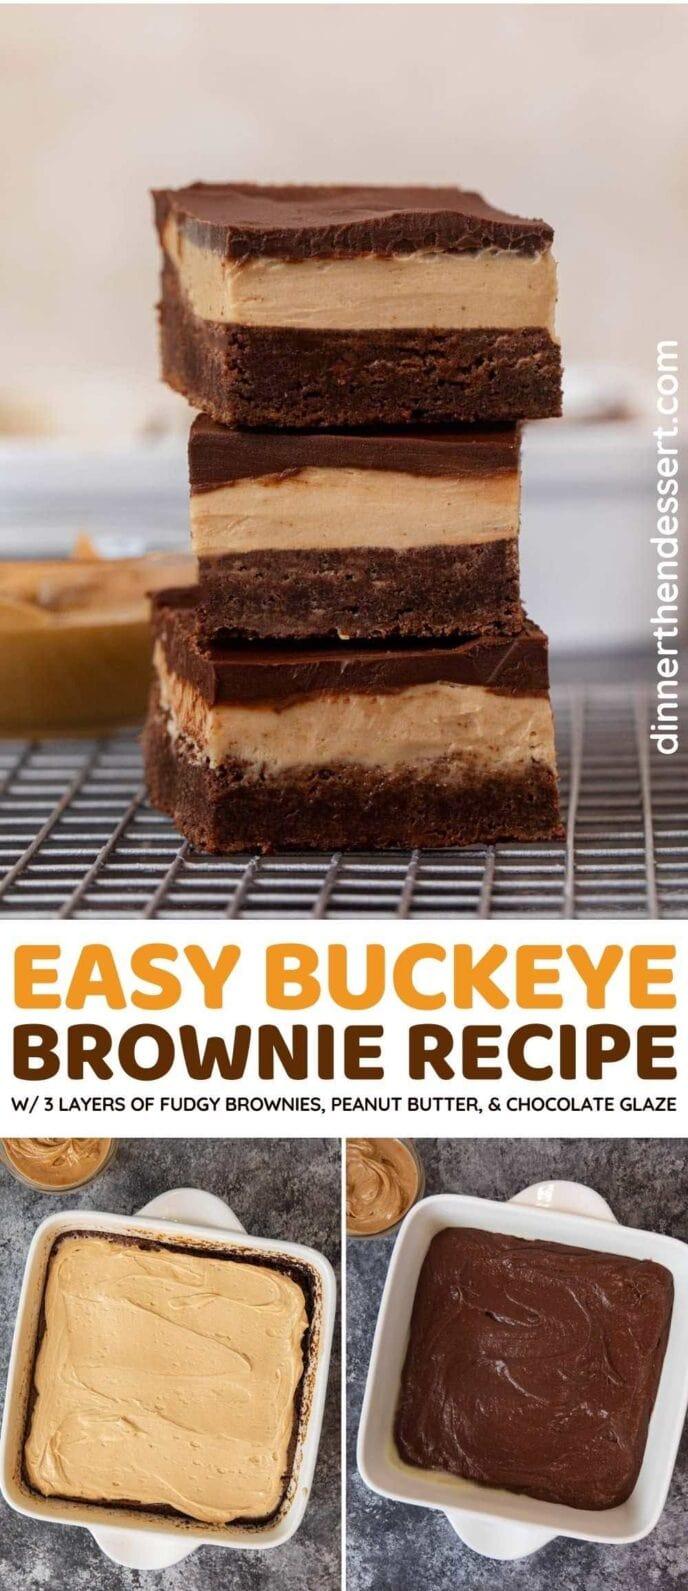 Buckeye Brownies collage